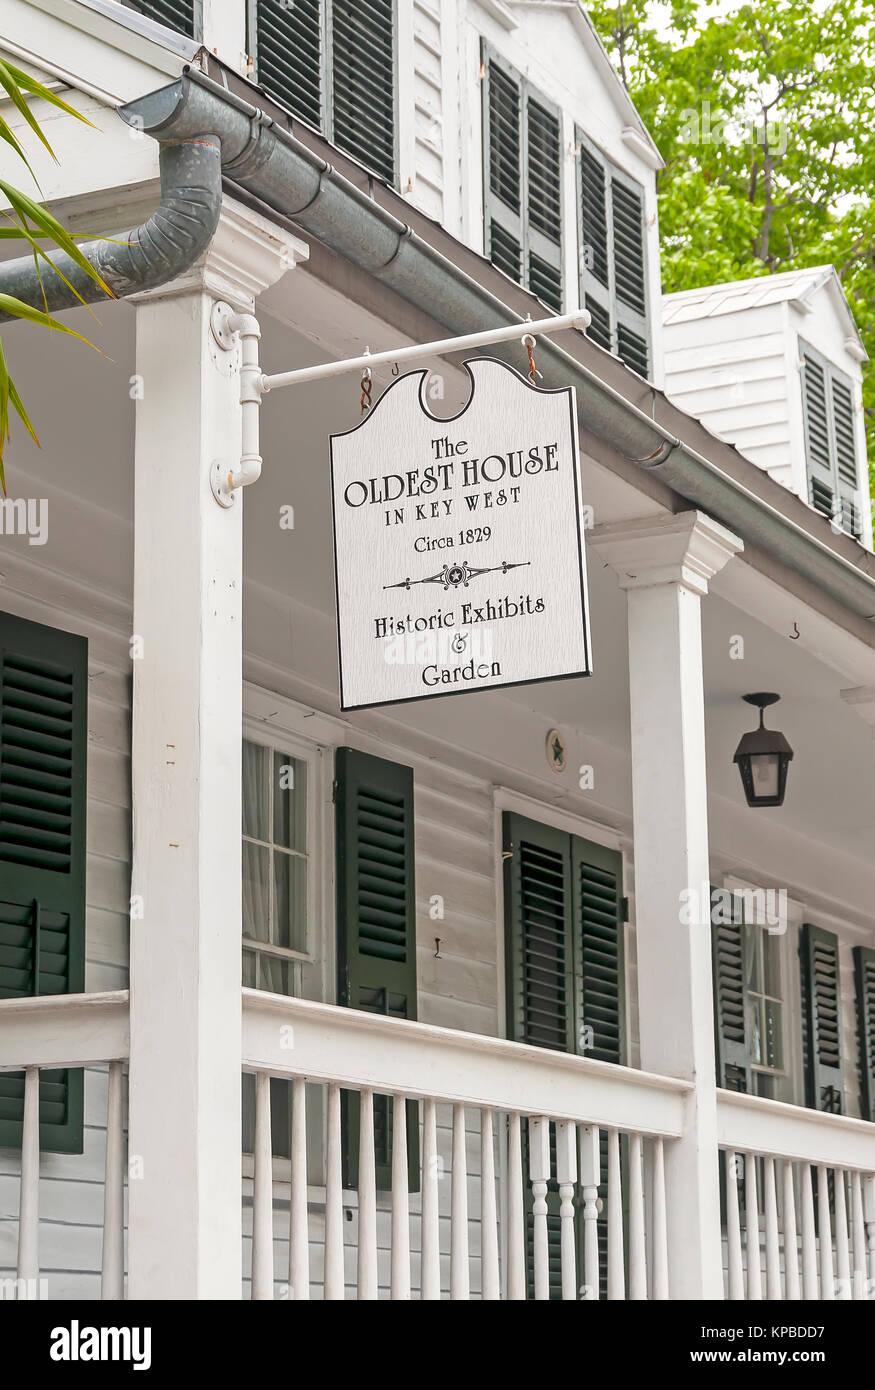 Oldest house in Key West built 1829, Key West, Florida - Stock Image